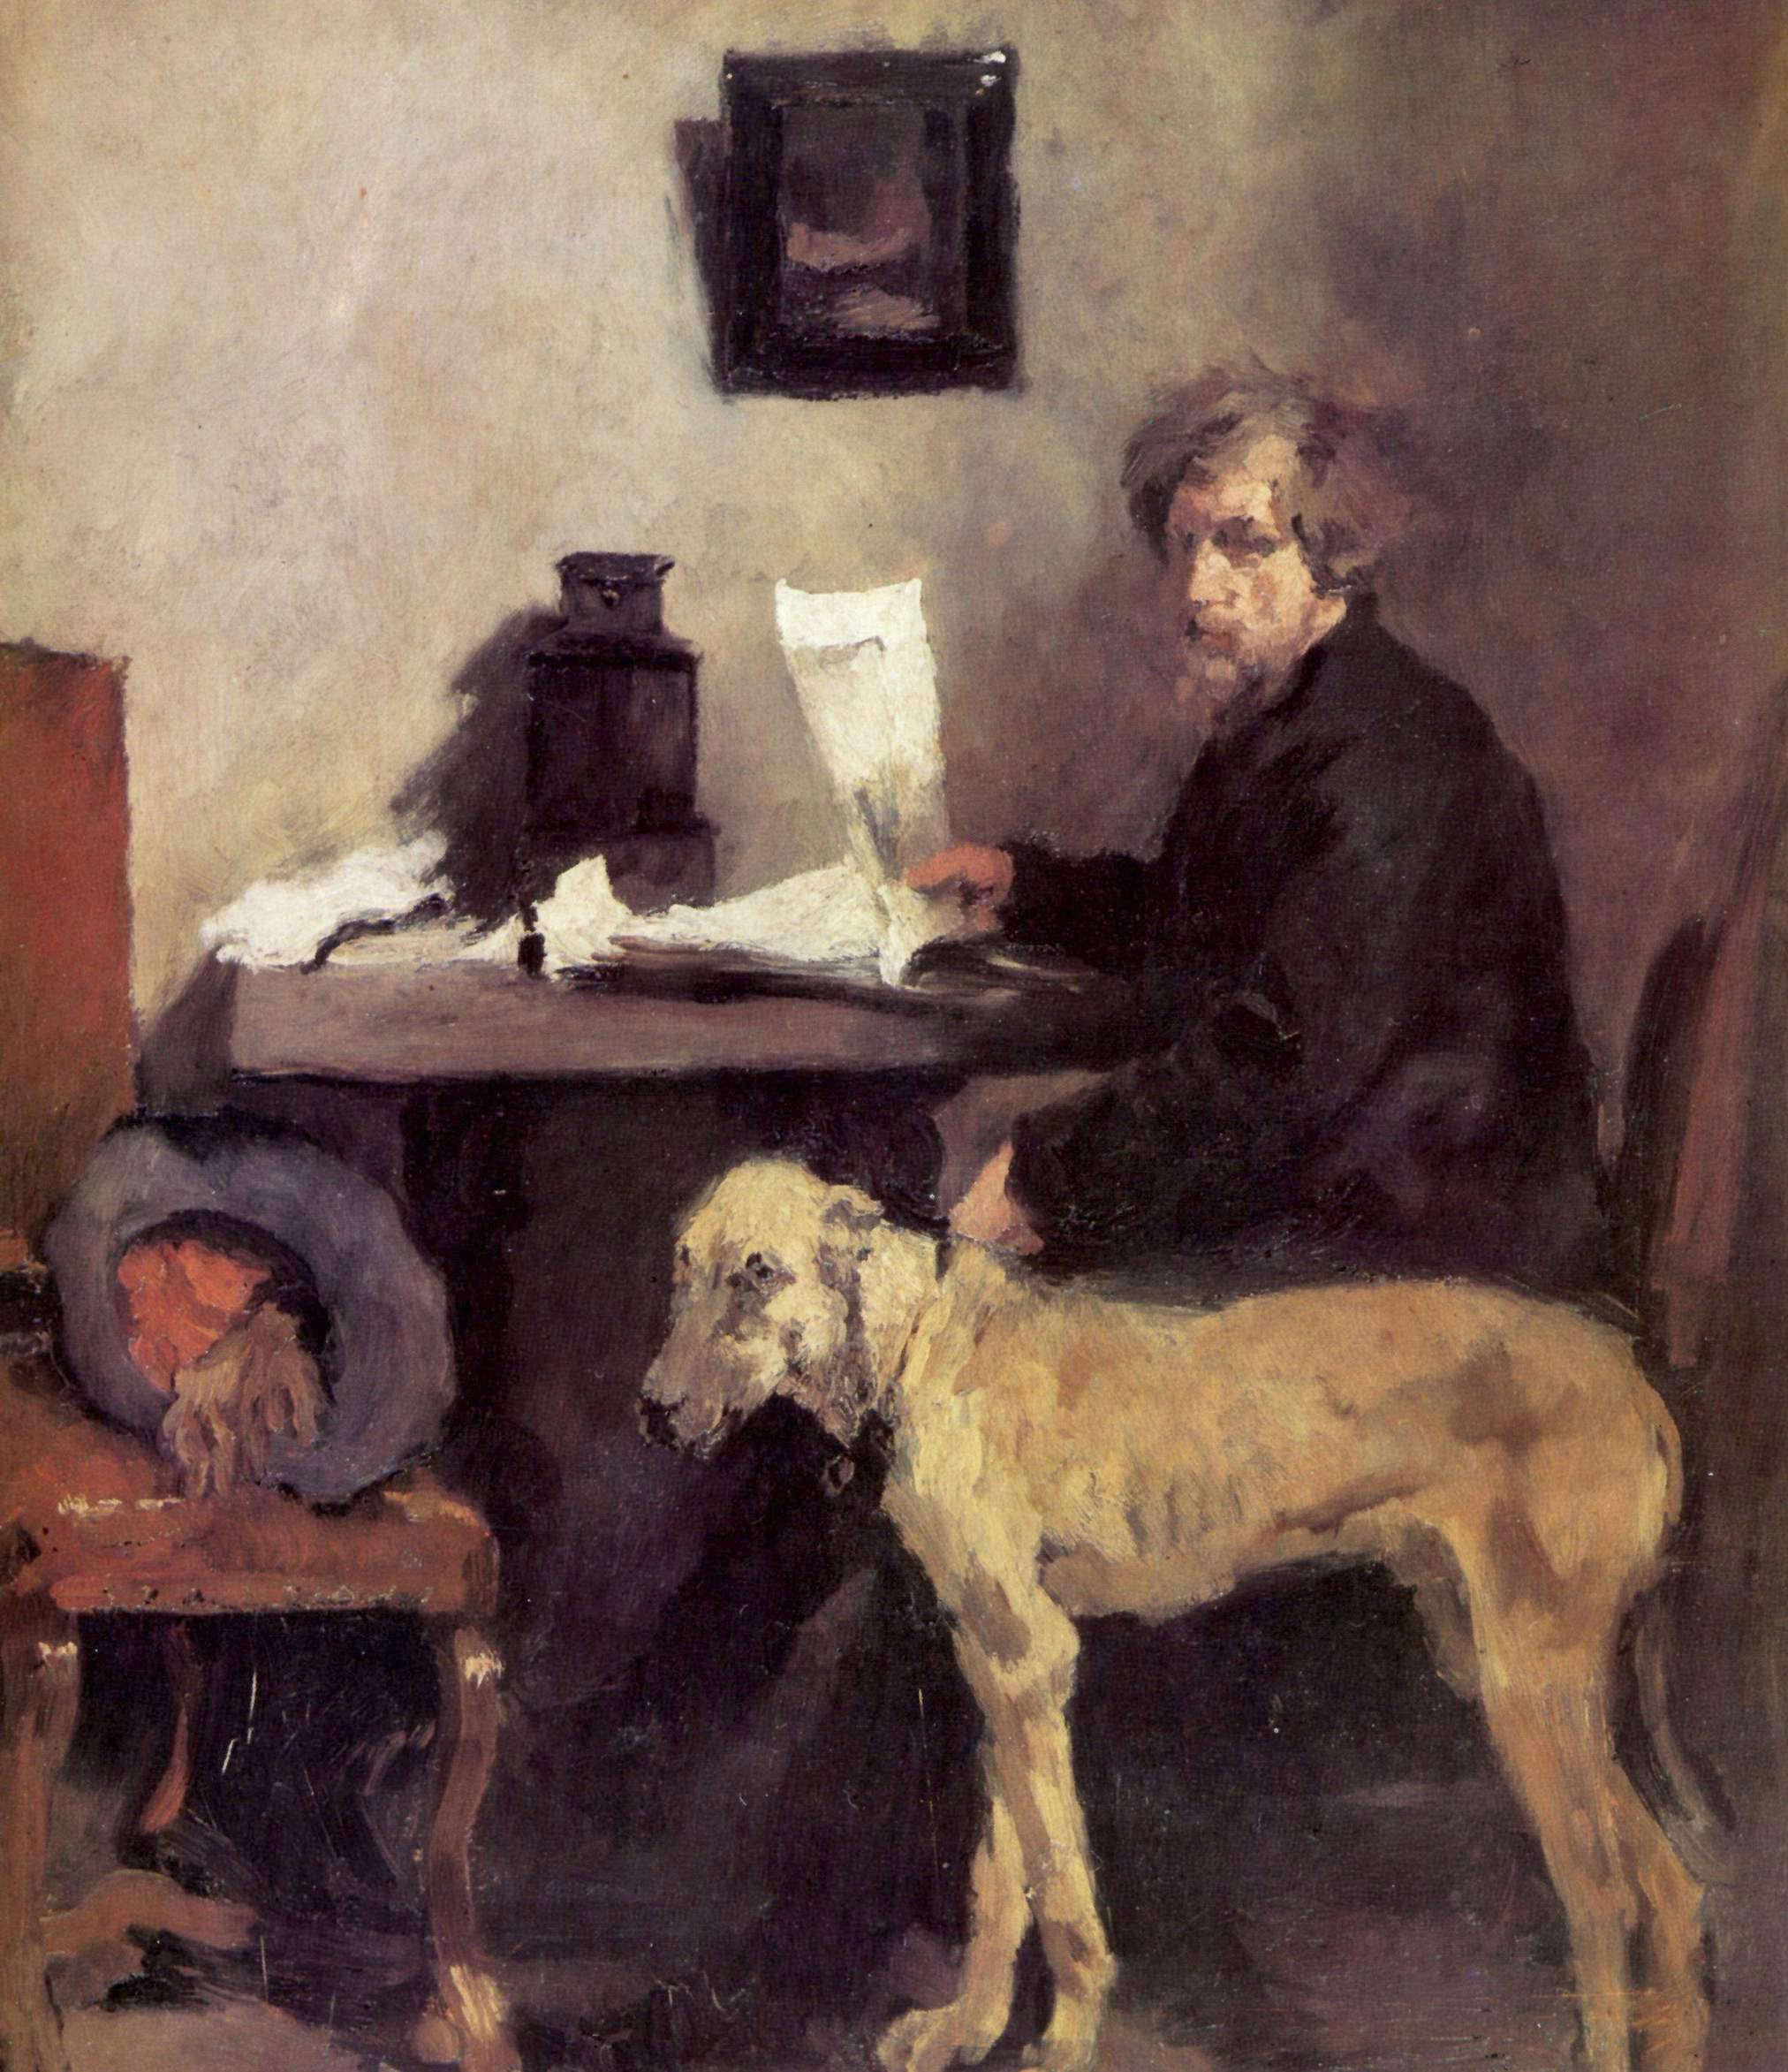 Wilhelm Maria Hubertus Leibl . Der Maler Sattler mit Dogge . Öl /Leinwand . 71,7 x 62,2 cm